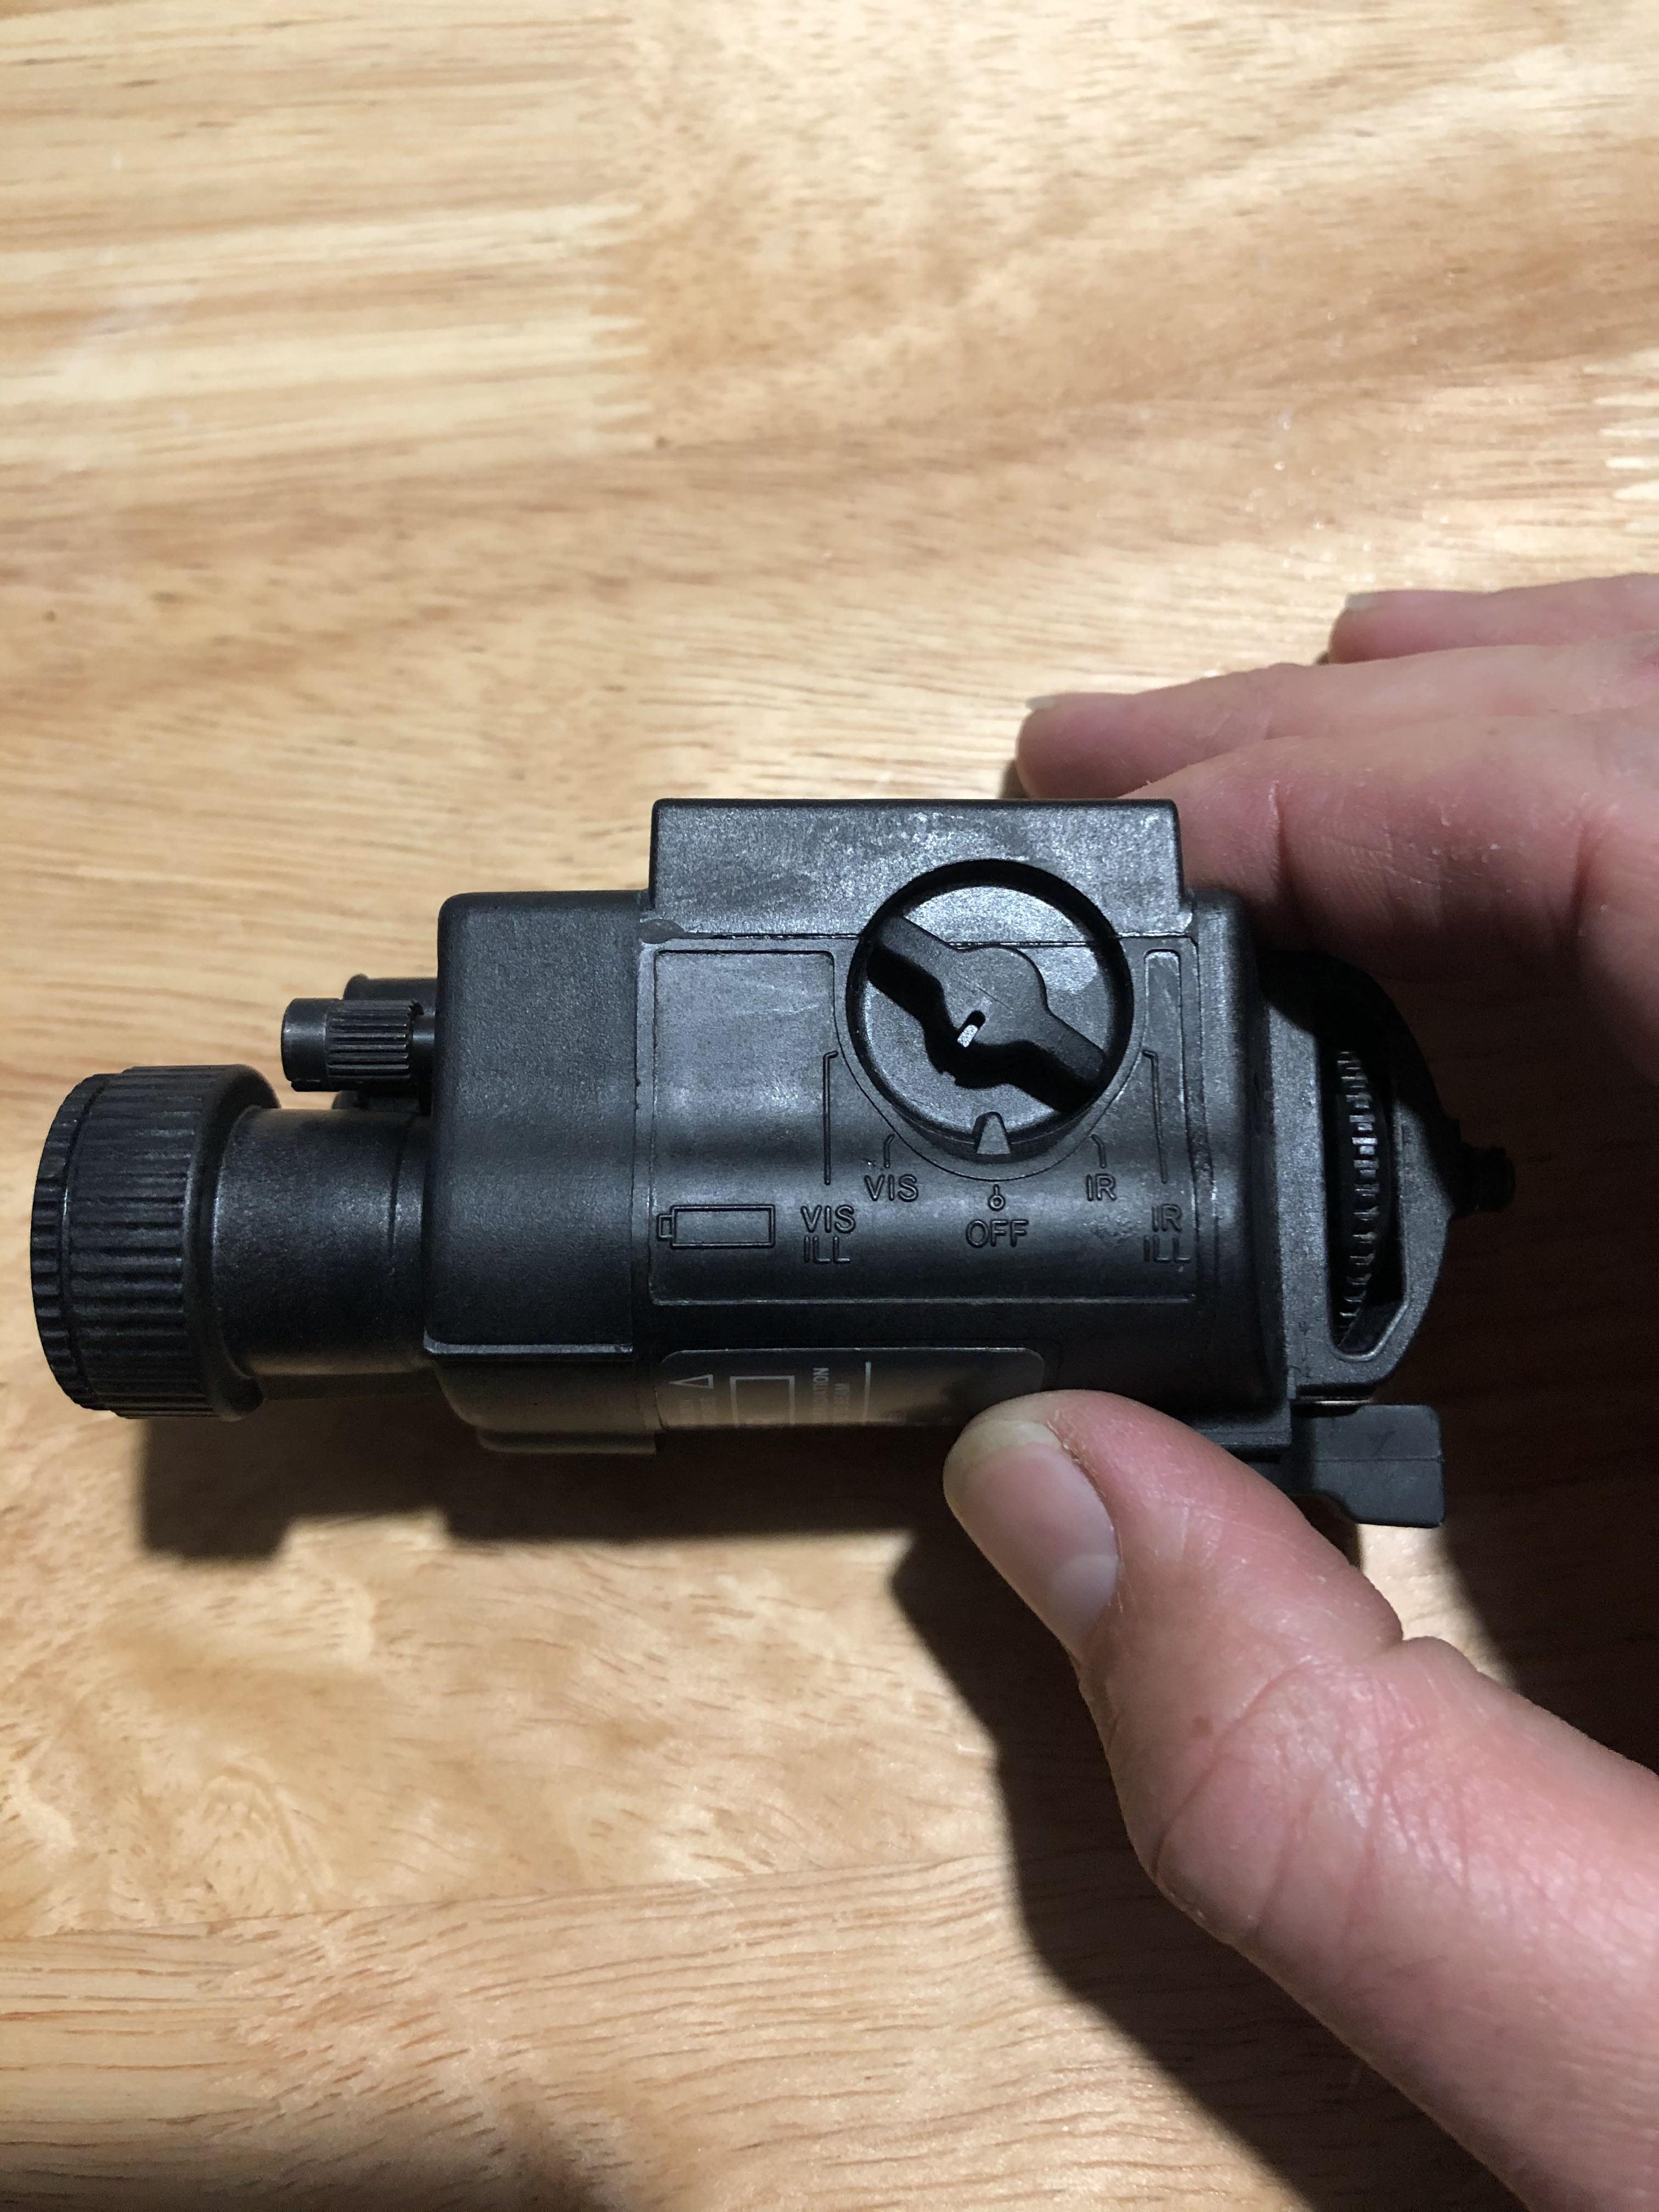 WTS: Insight LAM model 1450-insight-4.jpg